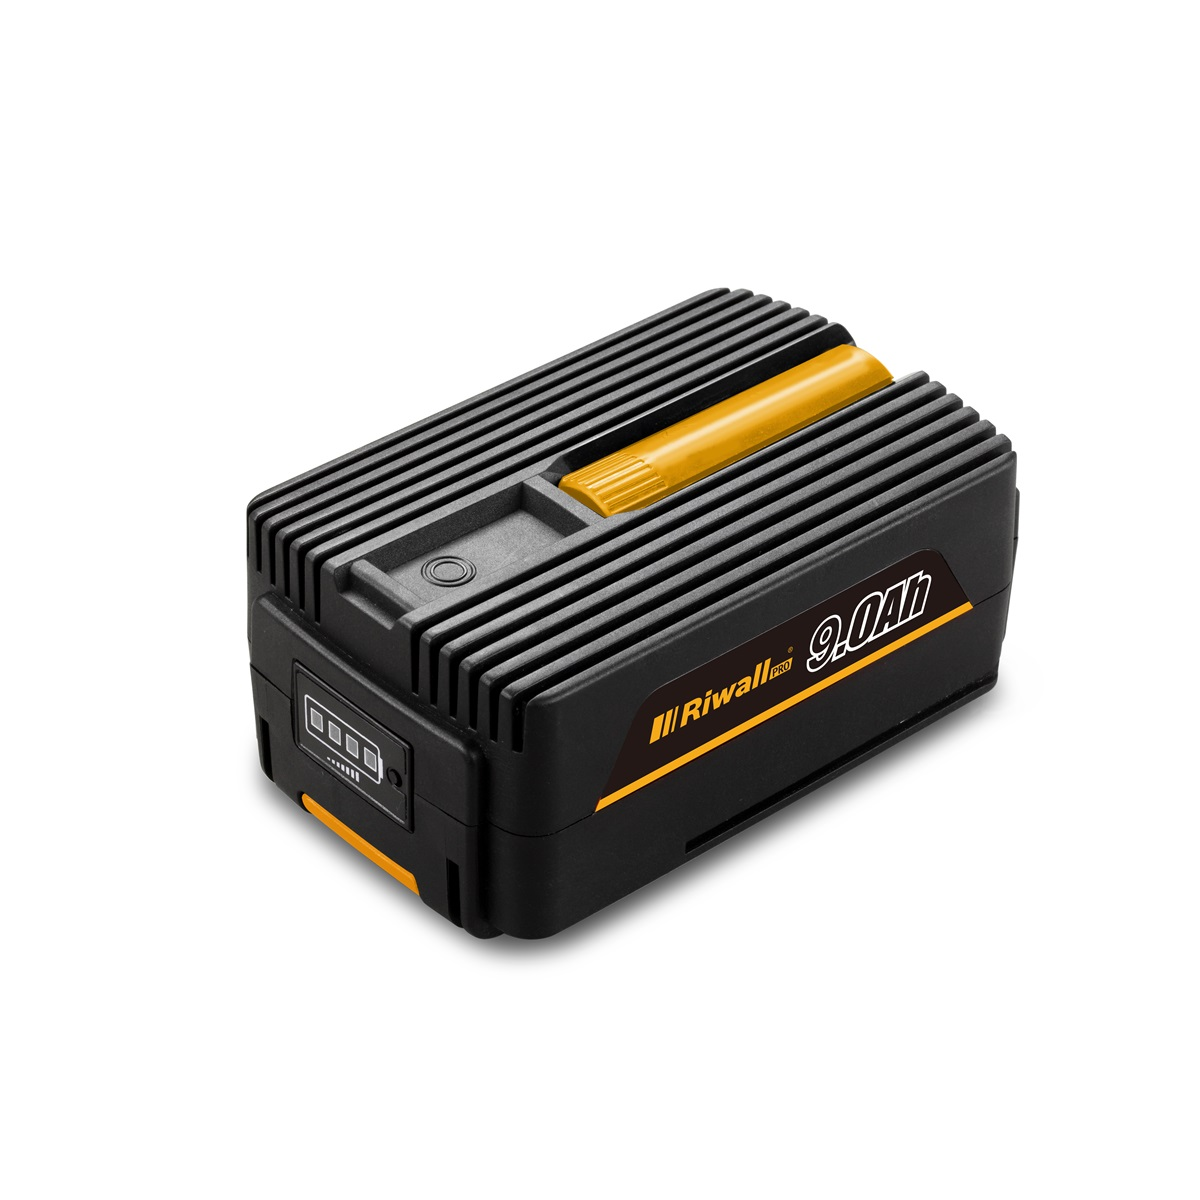 Riwall PRO RAB 940 baterie 40 V (9 Ah)